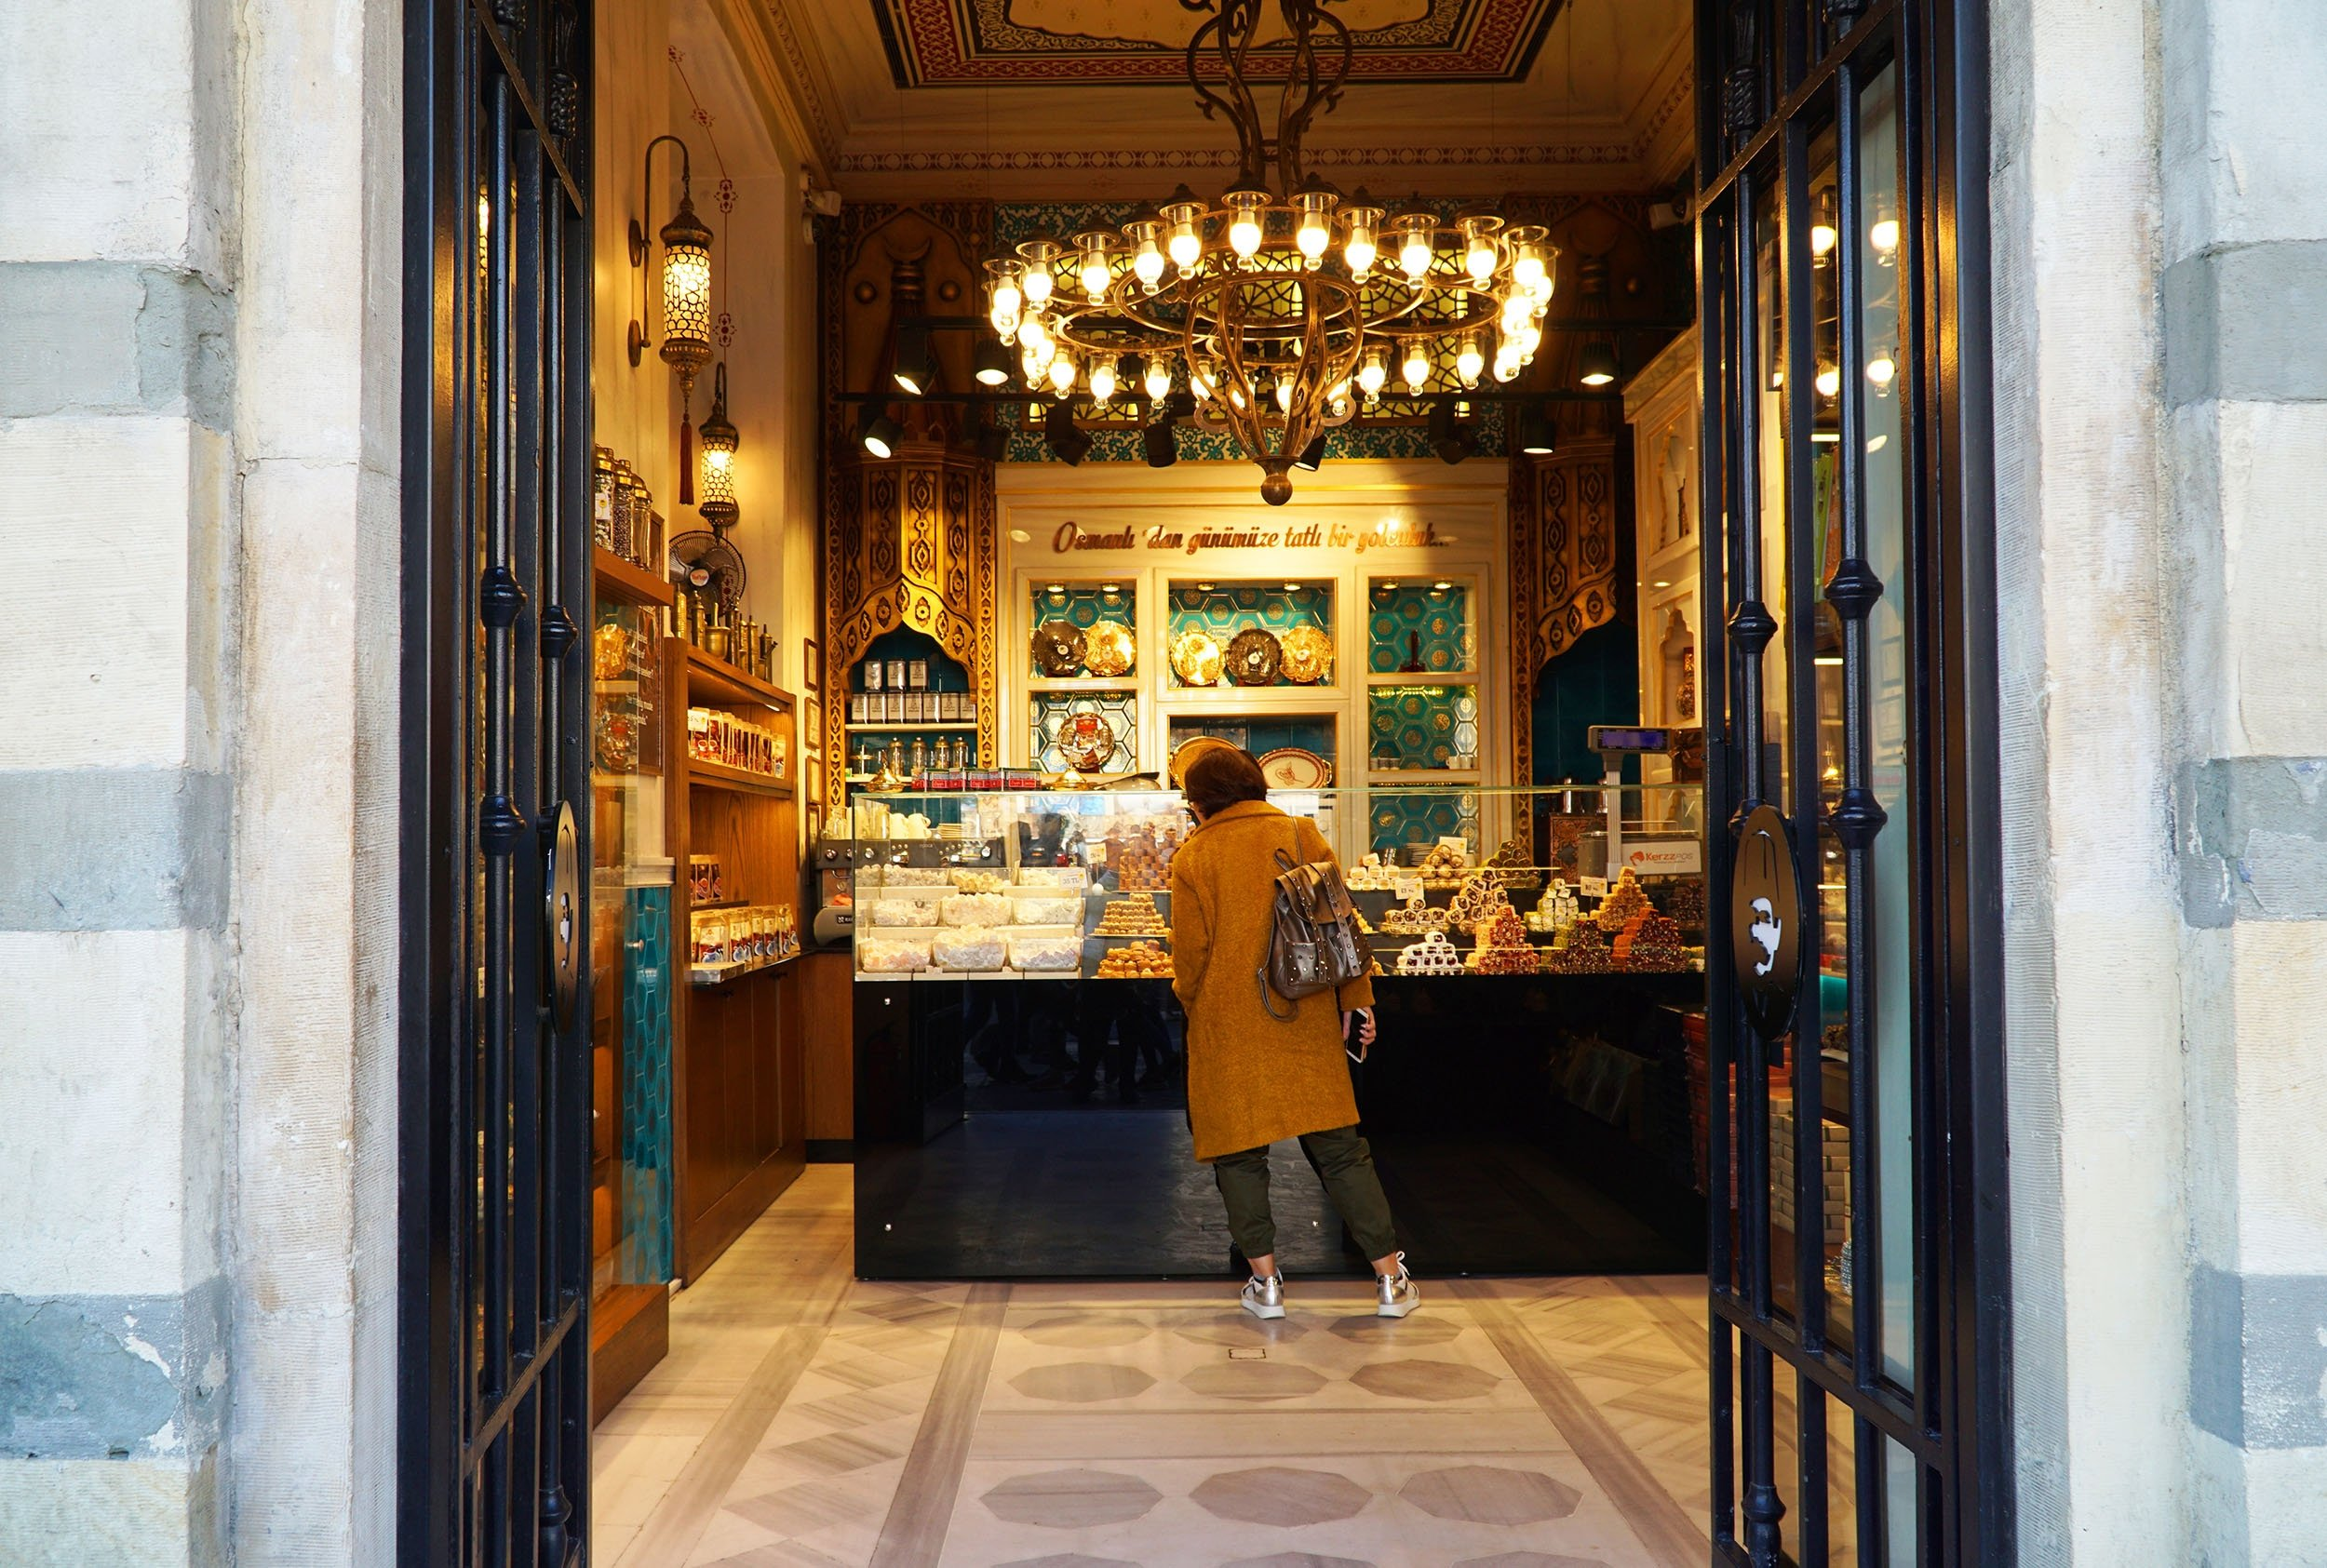 Aview of the historical Hacı Bekir sweet shop in the Karaköy district,Istanbul, Turkey. (Shutterstock Photo)